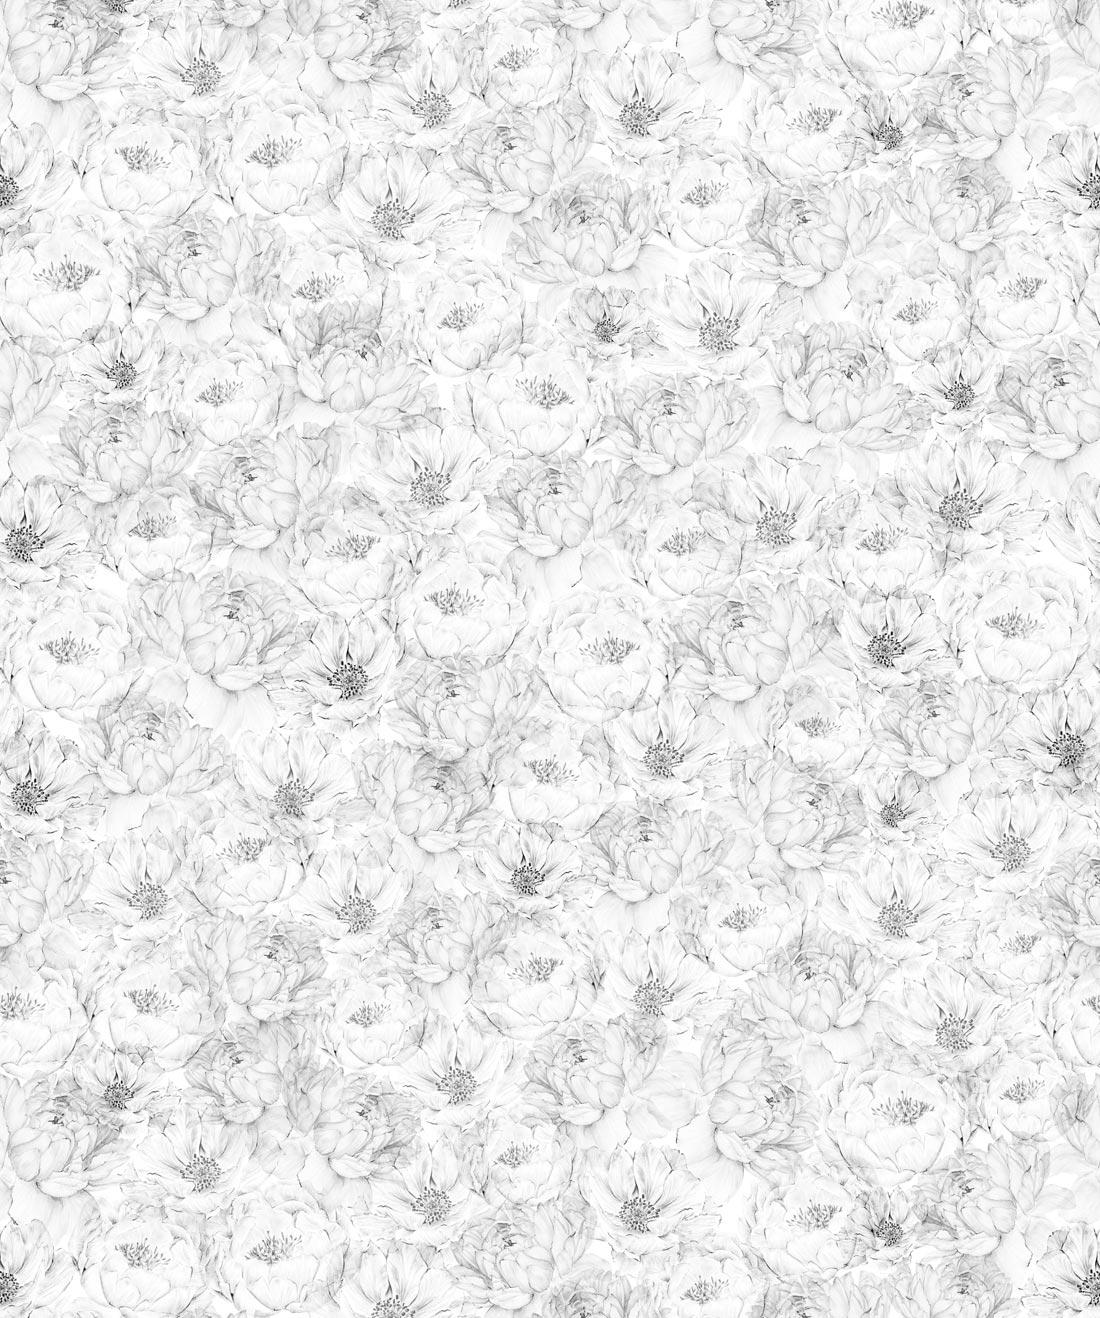 Roses & Butterflies Wallpaper, Unique Designer Wallpaper